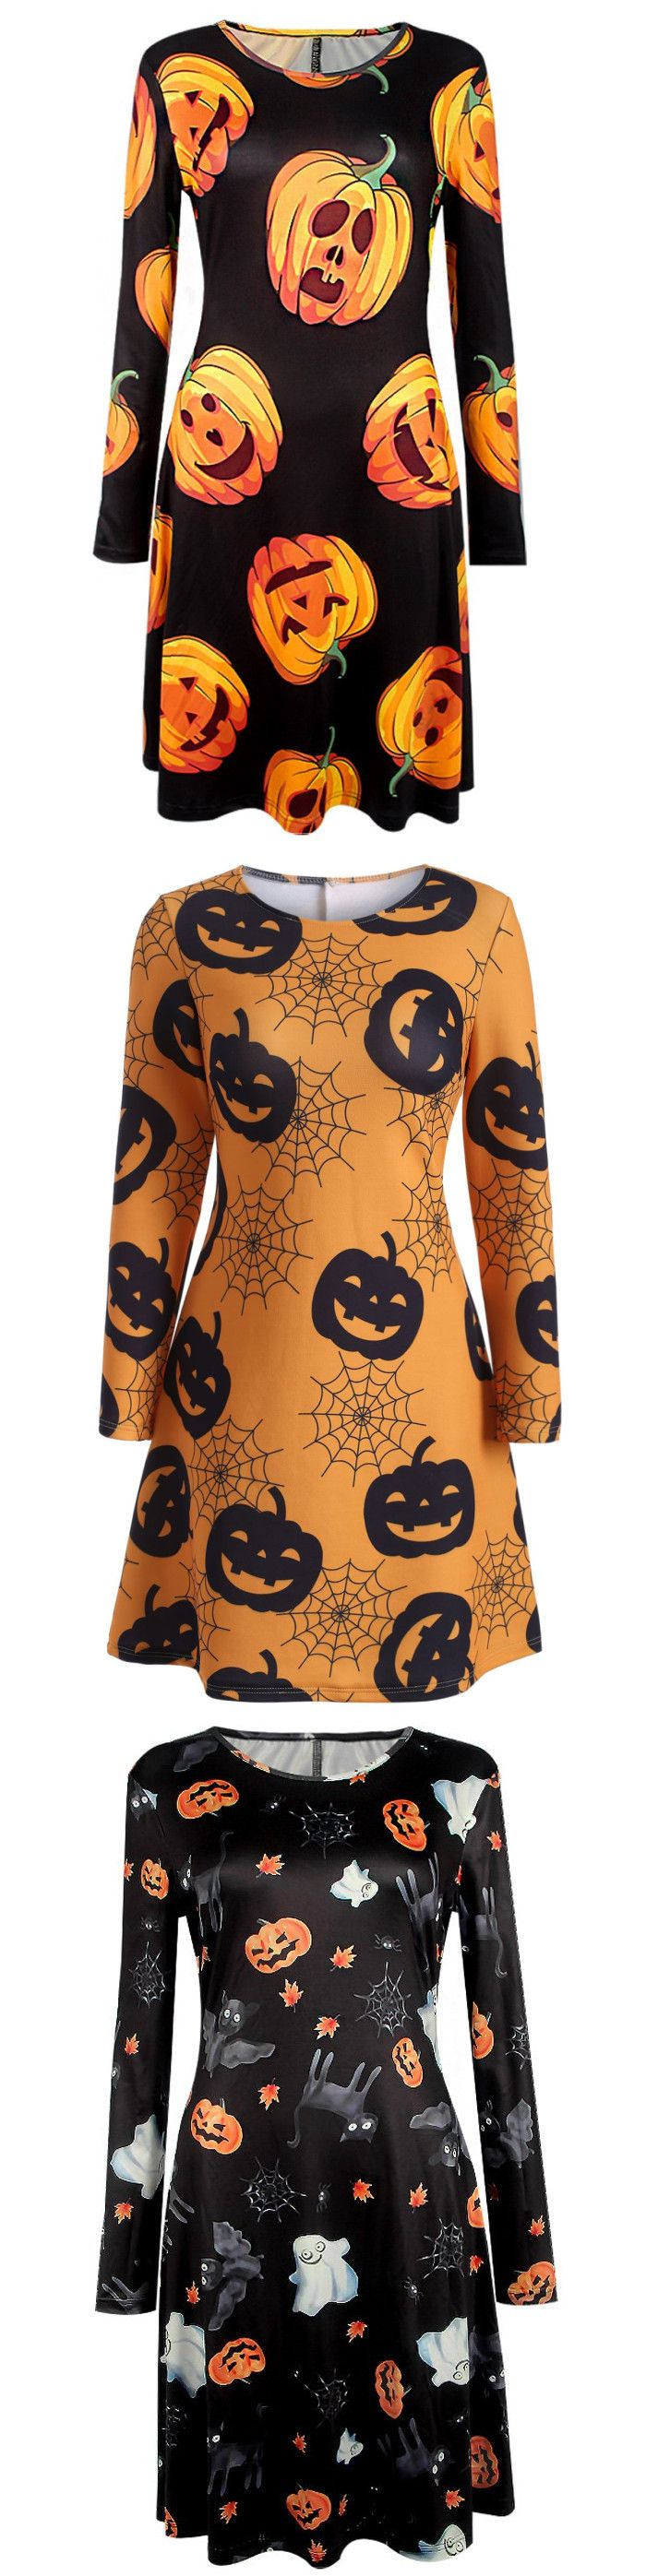 Happy Halloween | Start at $7 | Halloween Swing Dress| Sammydress.com